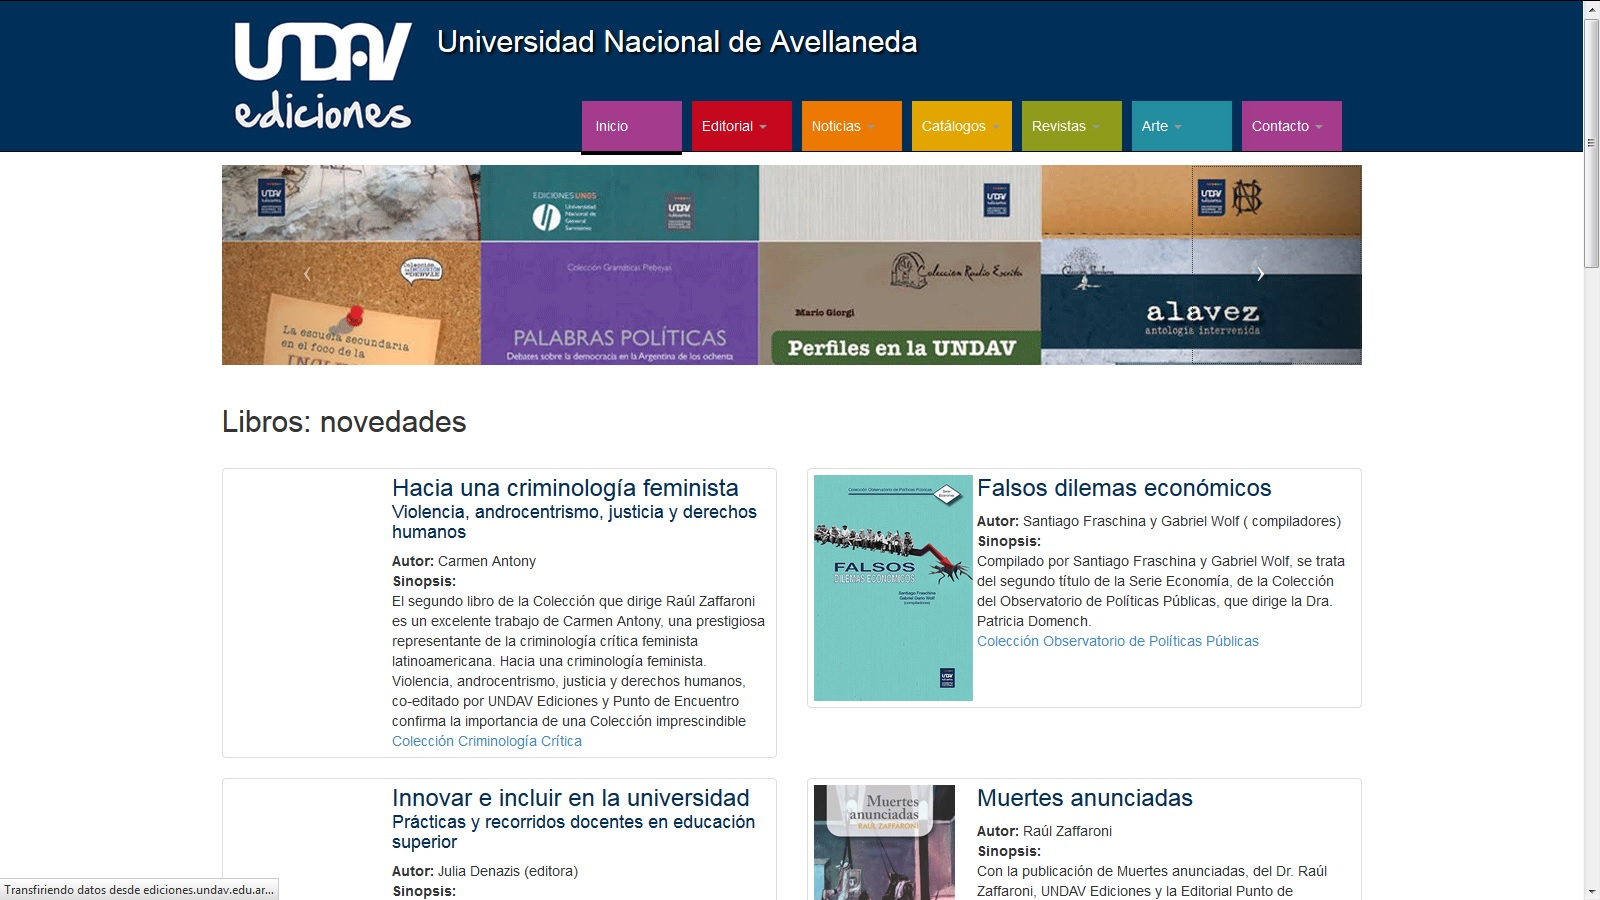 Editorial UNDAV - Editorial de la UNDAV